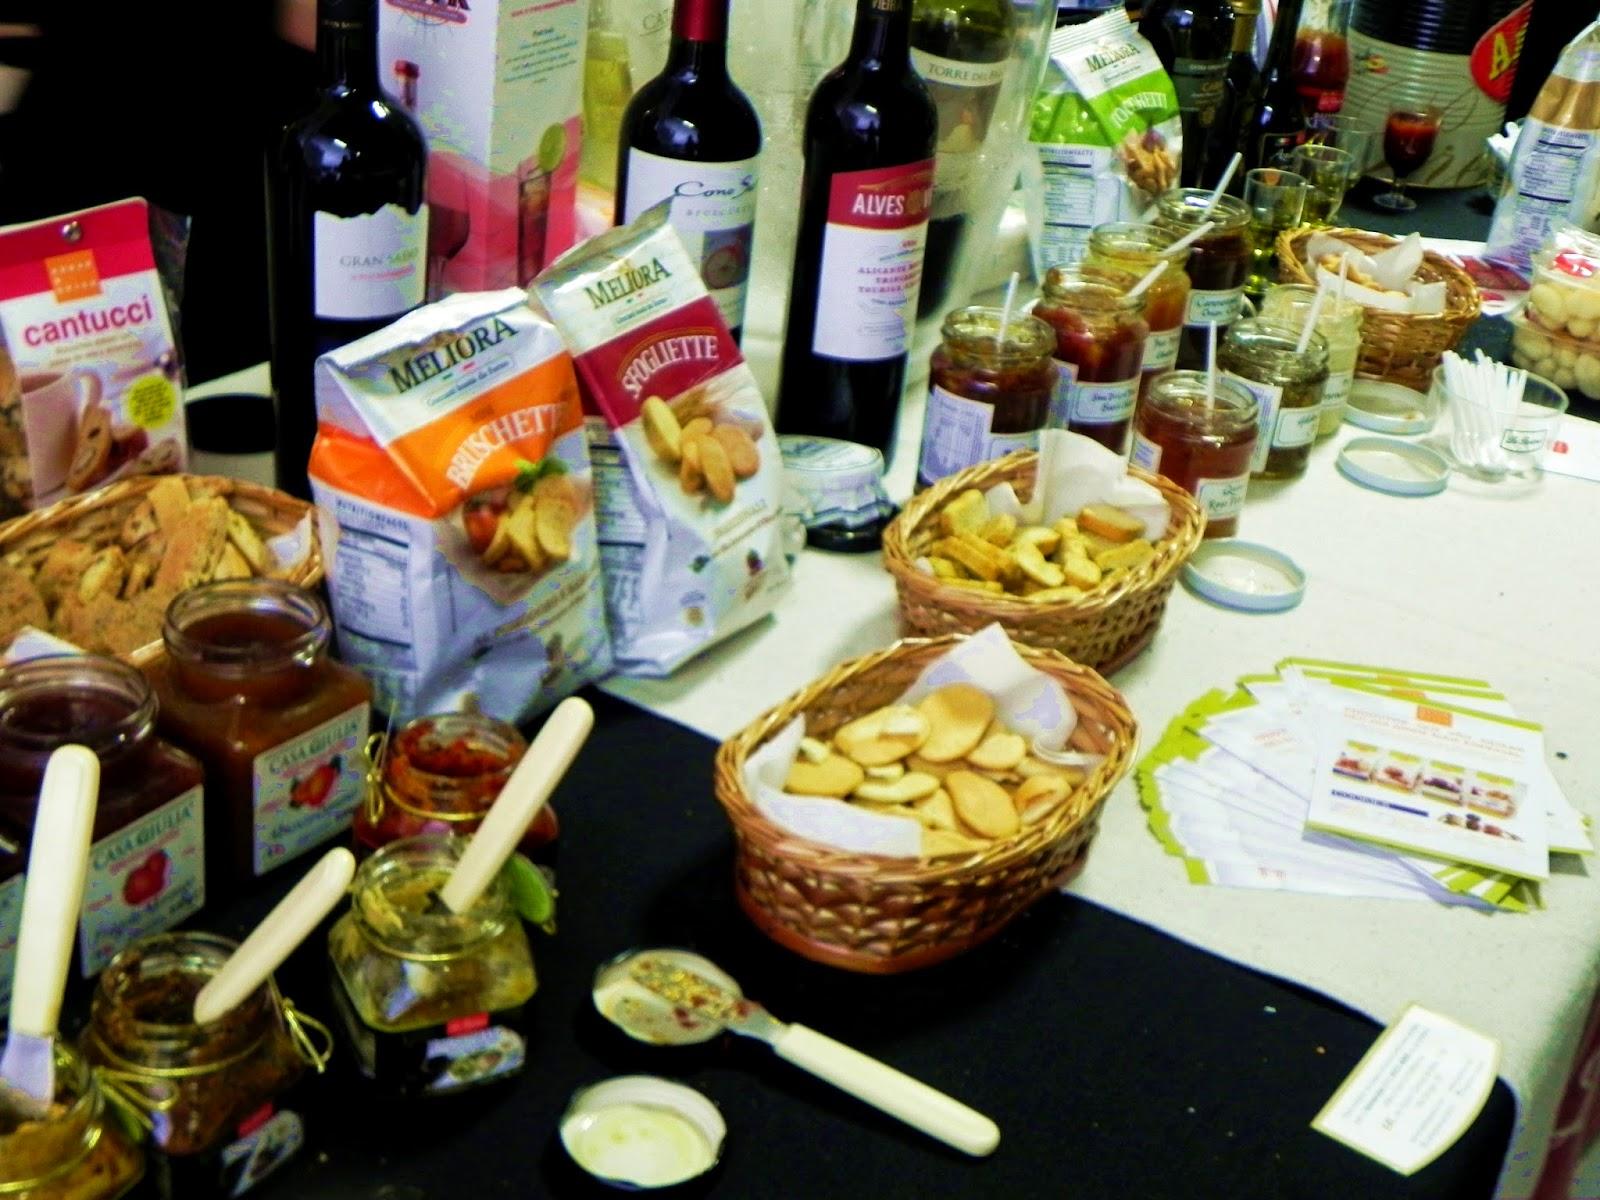 produtos la pastina importadora no 3 encontro gourmet